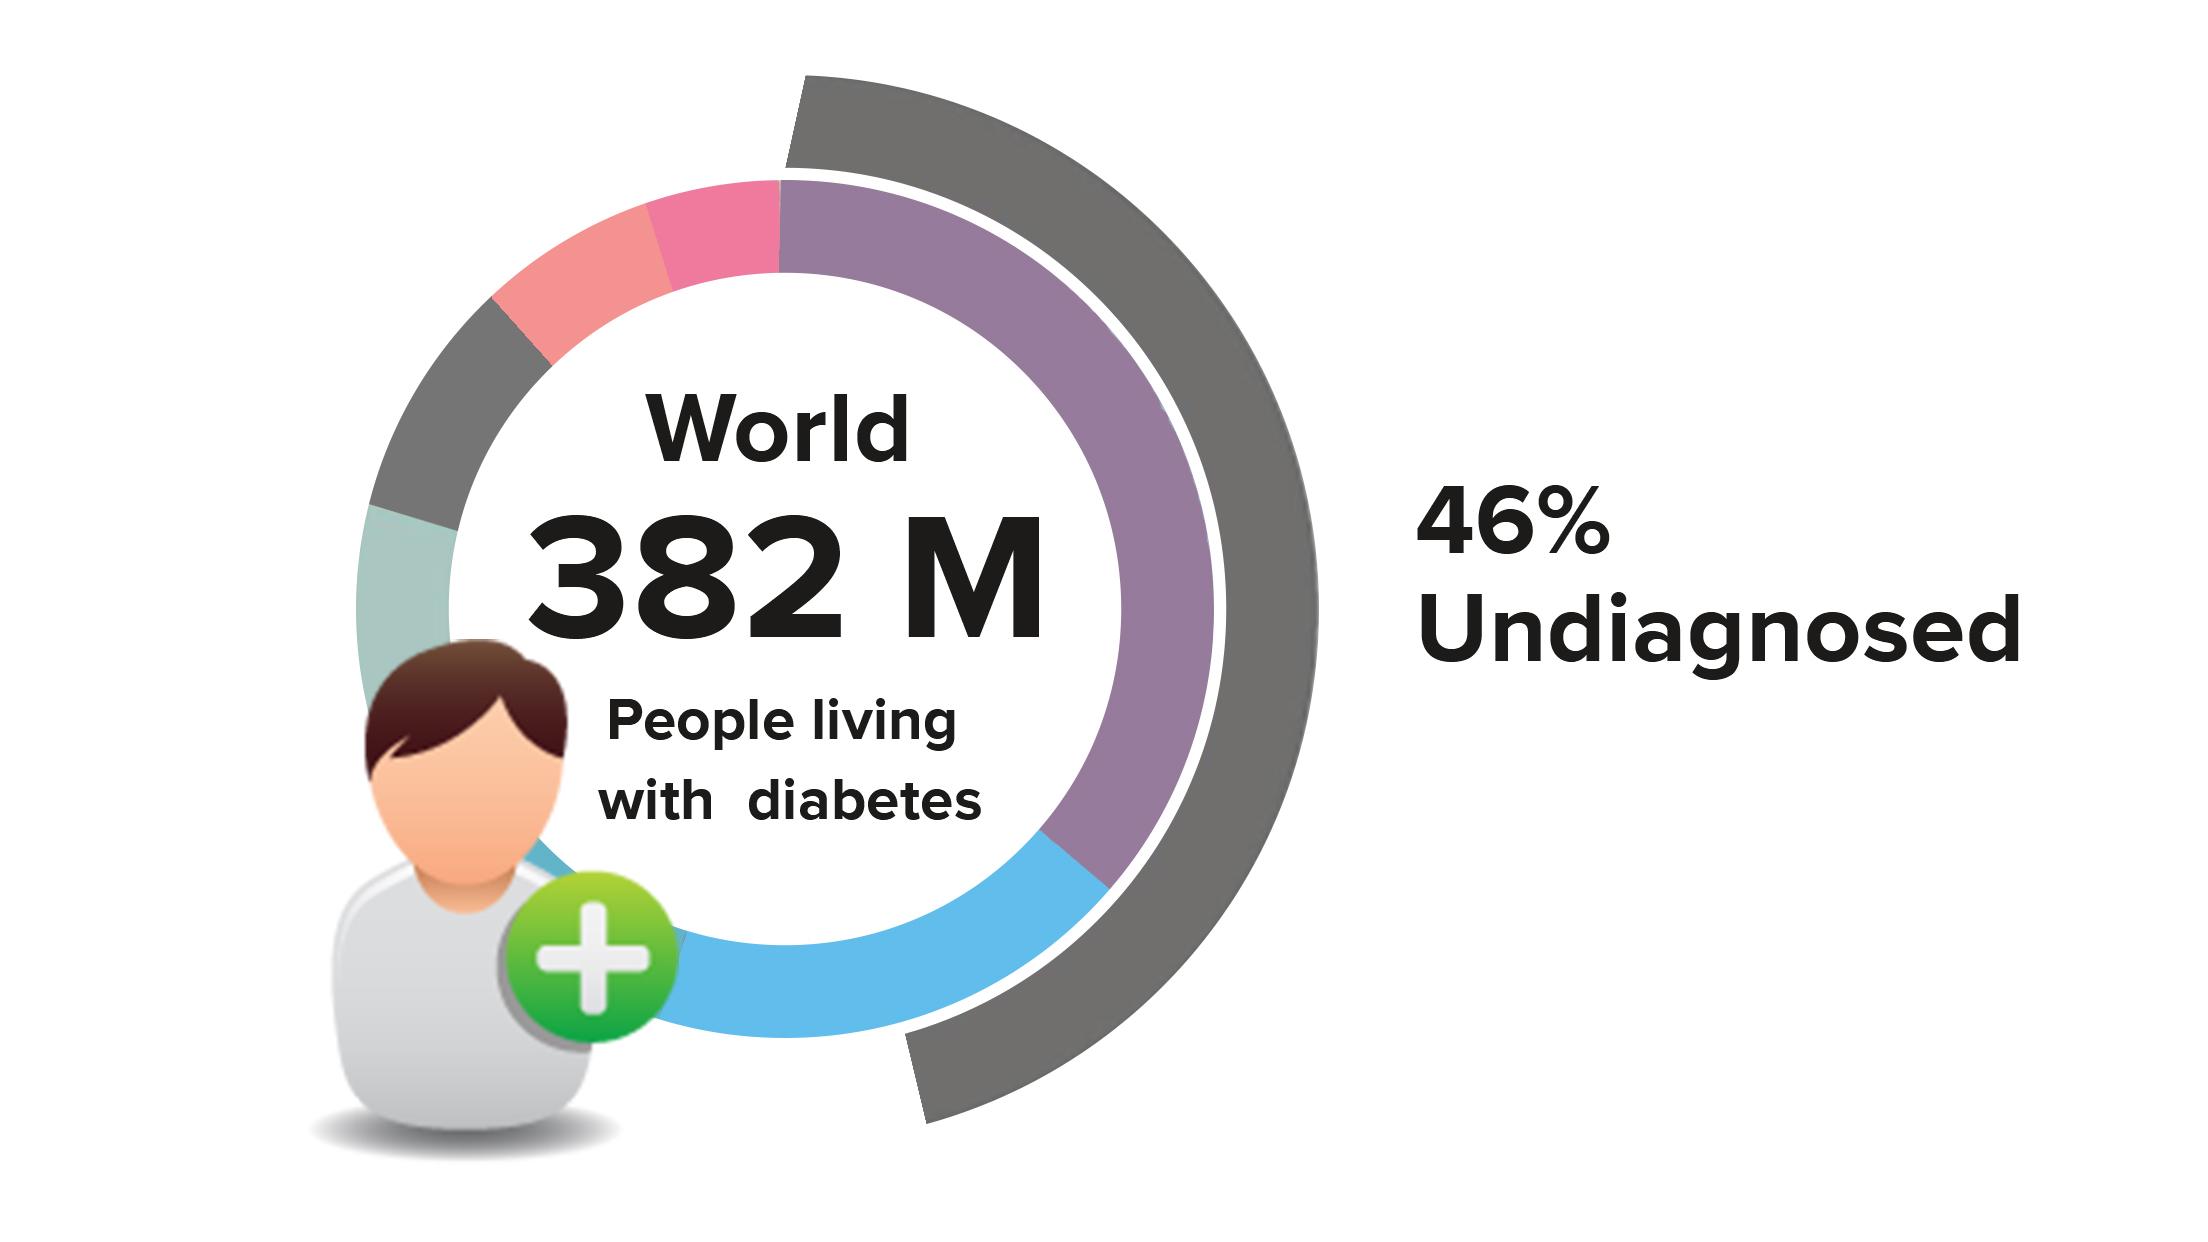 preventive diabetic care using AI